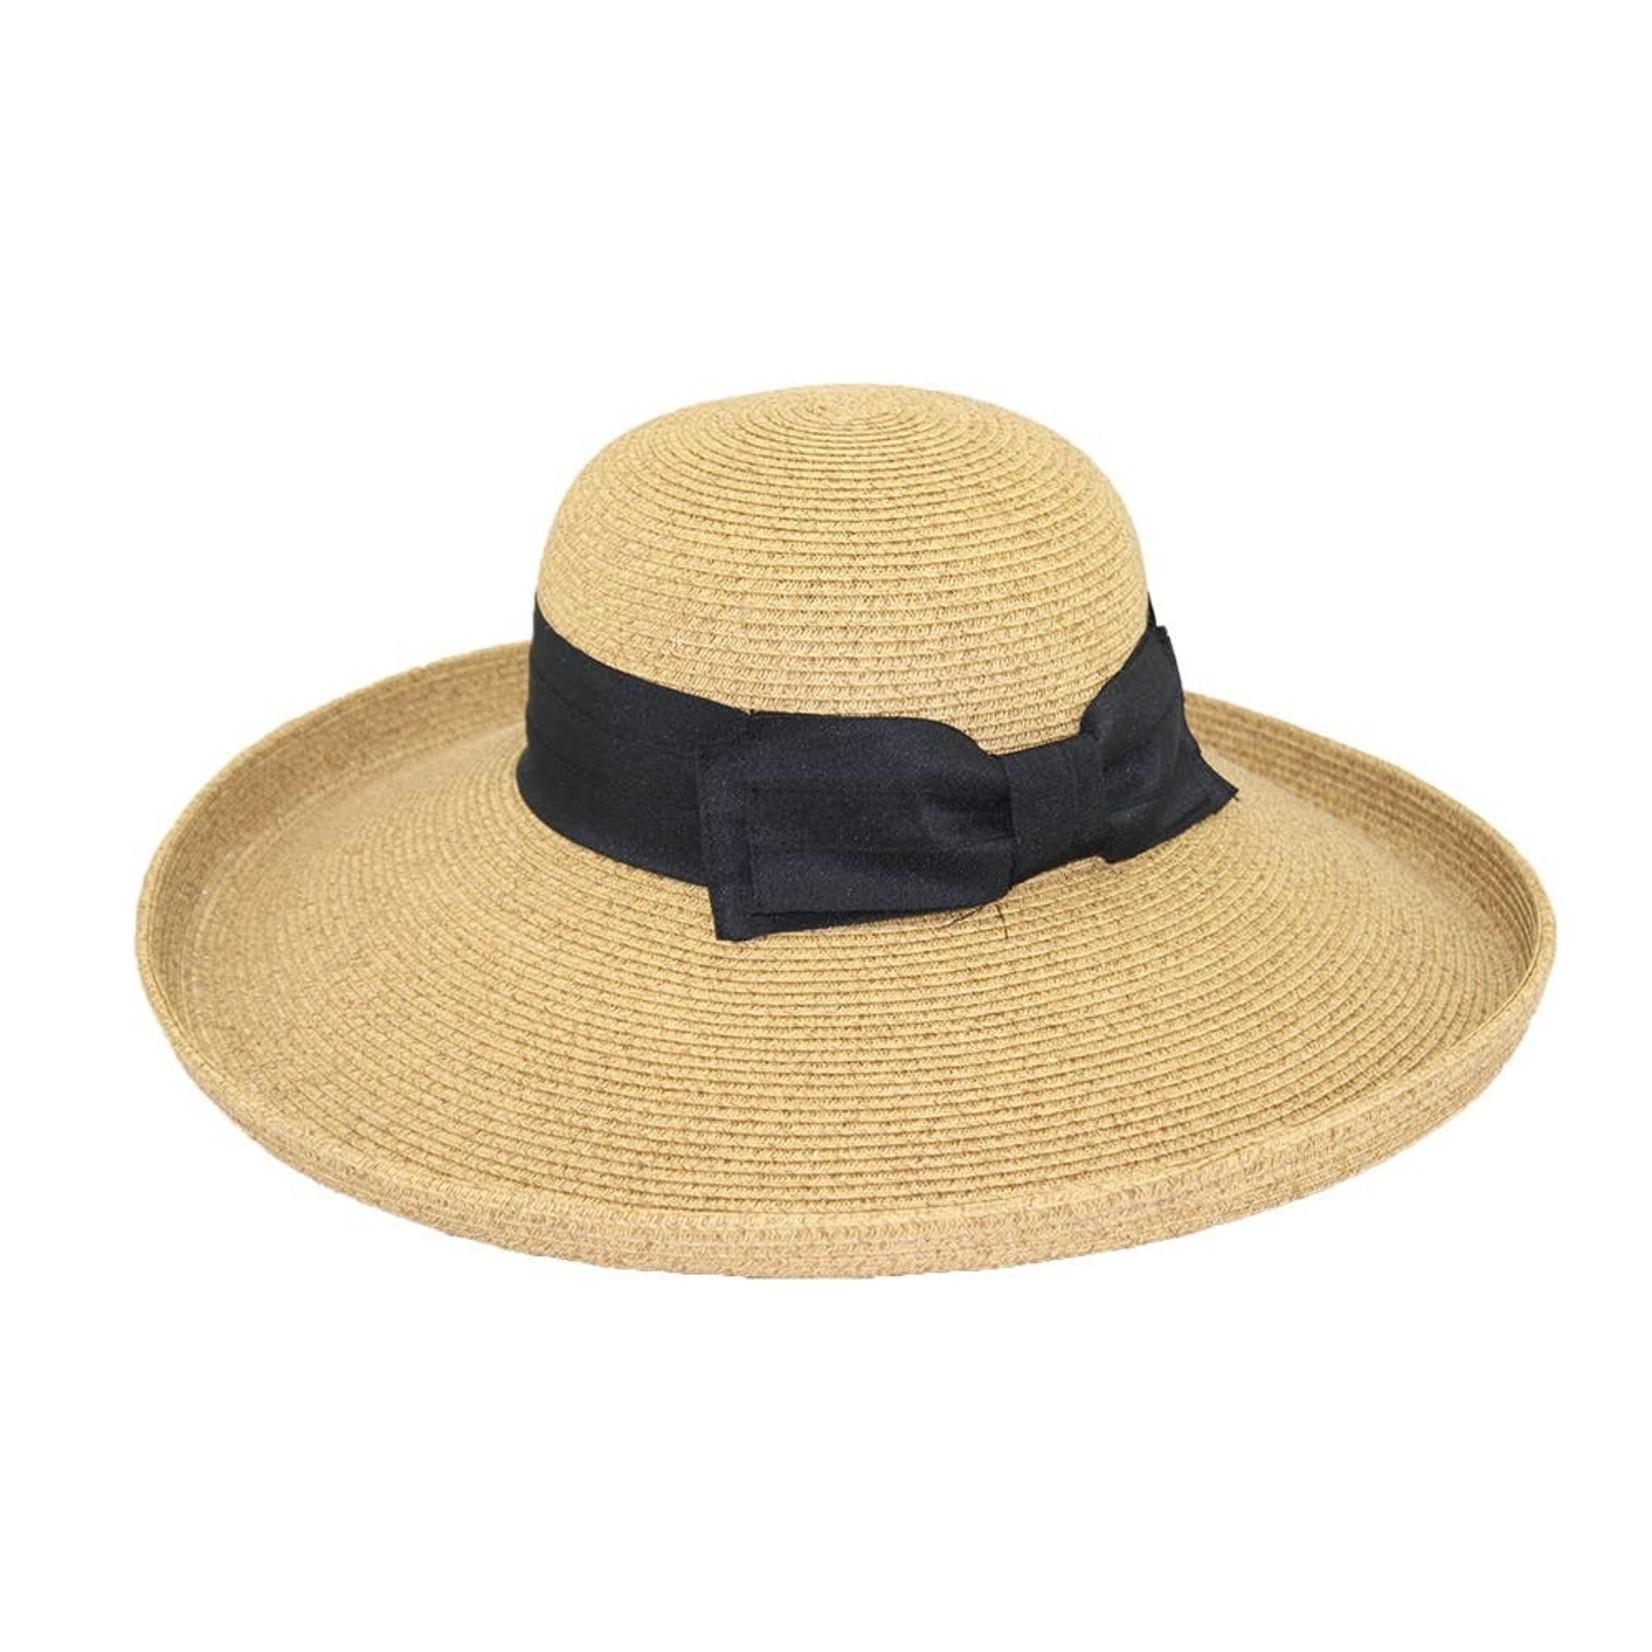 Jeanne Simmons Paper Braid Large Kettle Brim Toast Tweed Hat w/Blk Bow